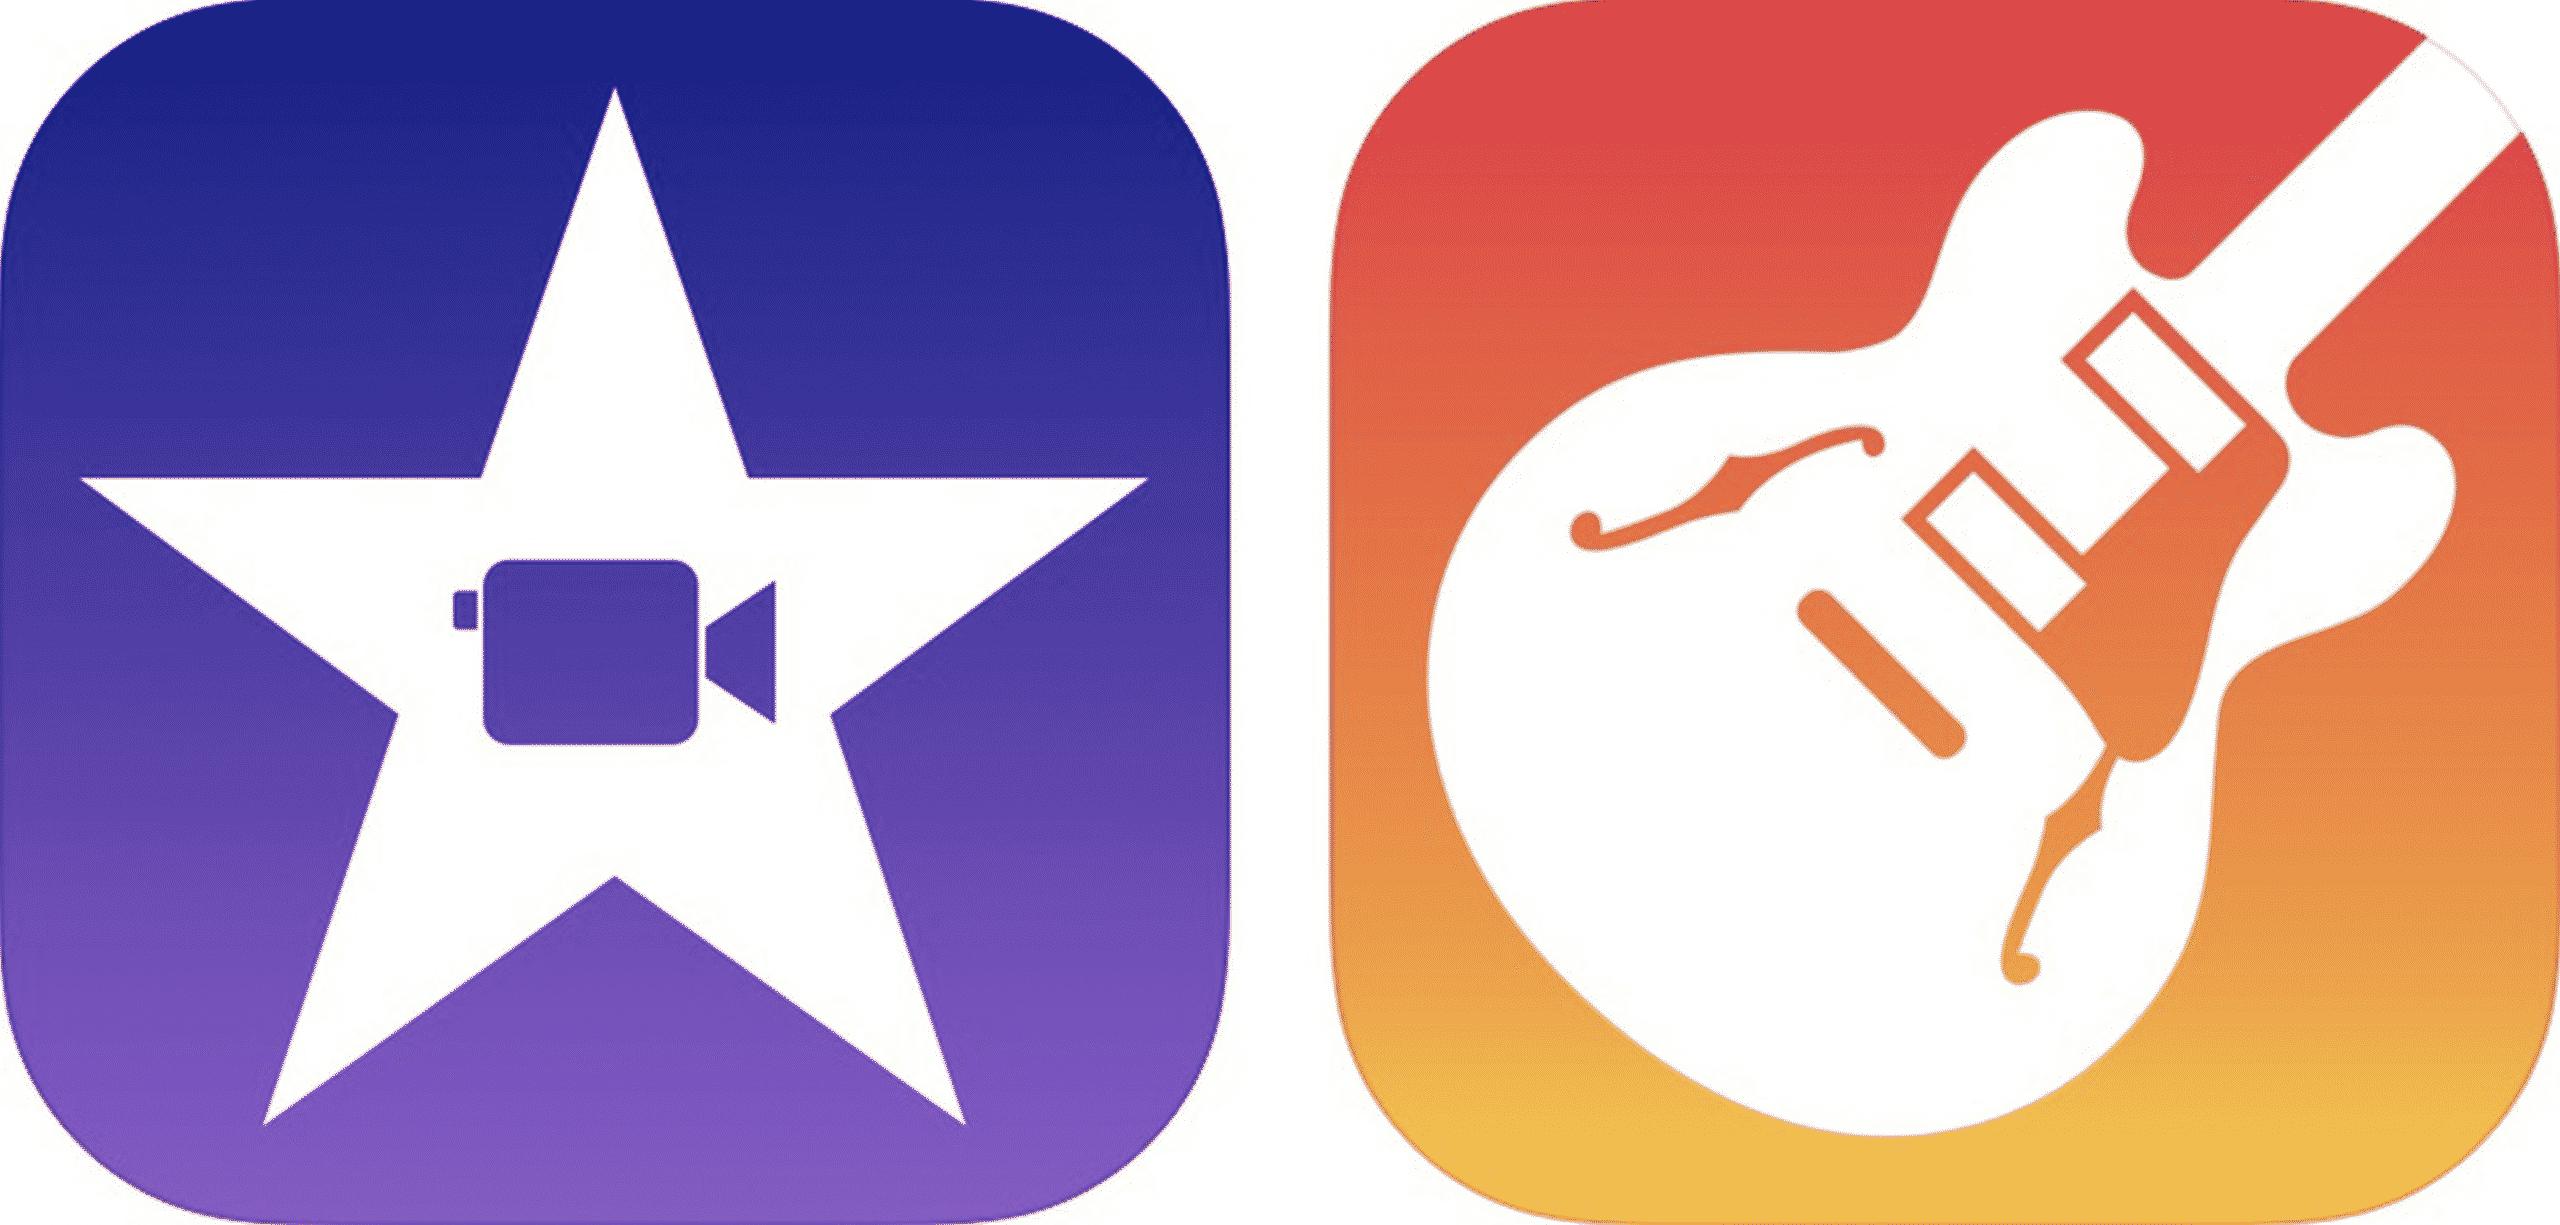 iOS GarageBand App, iMovie